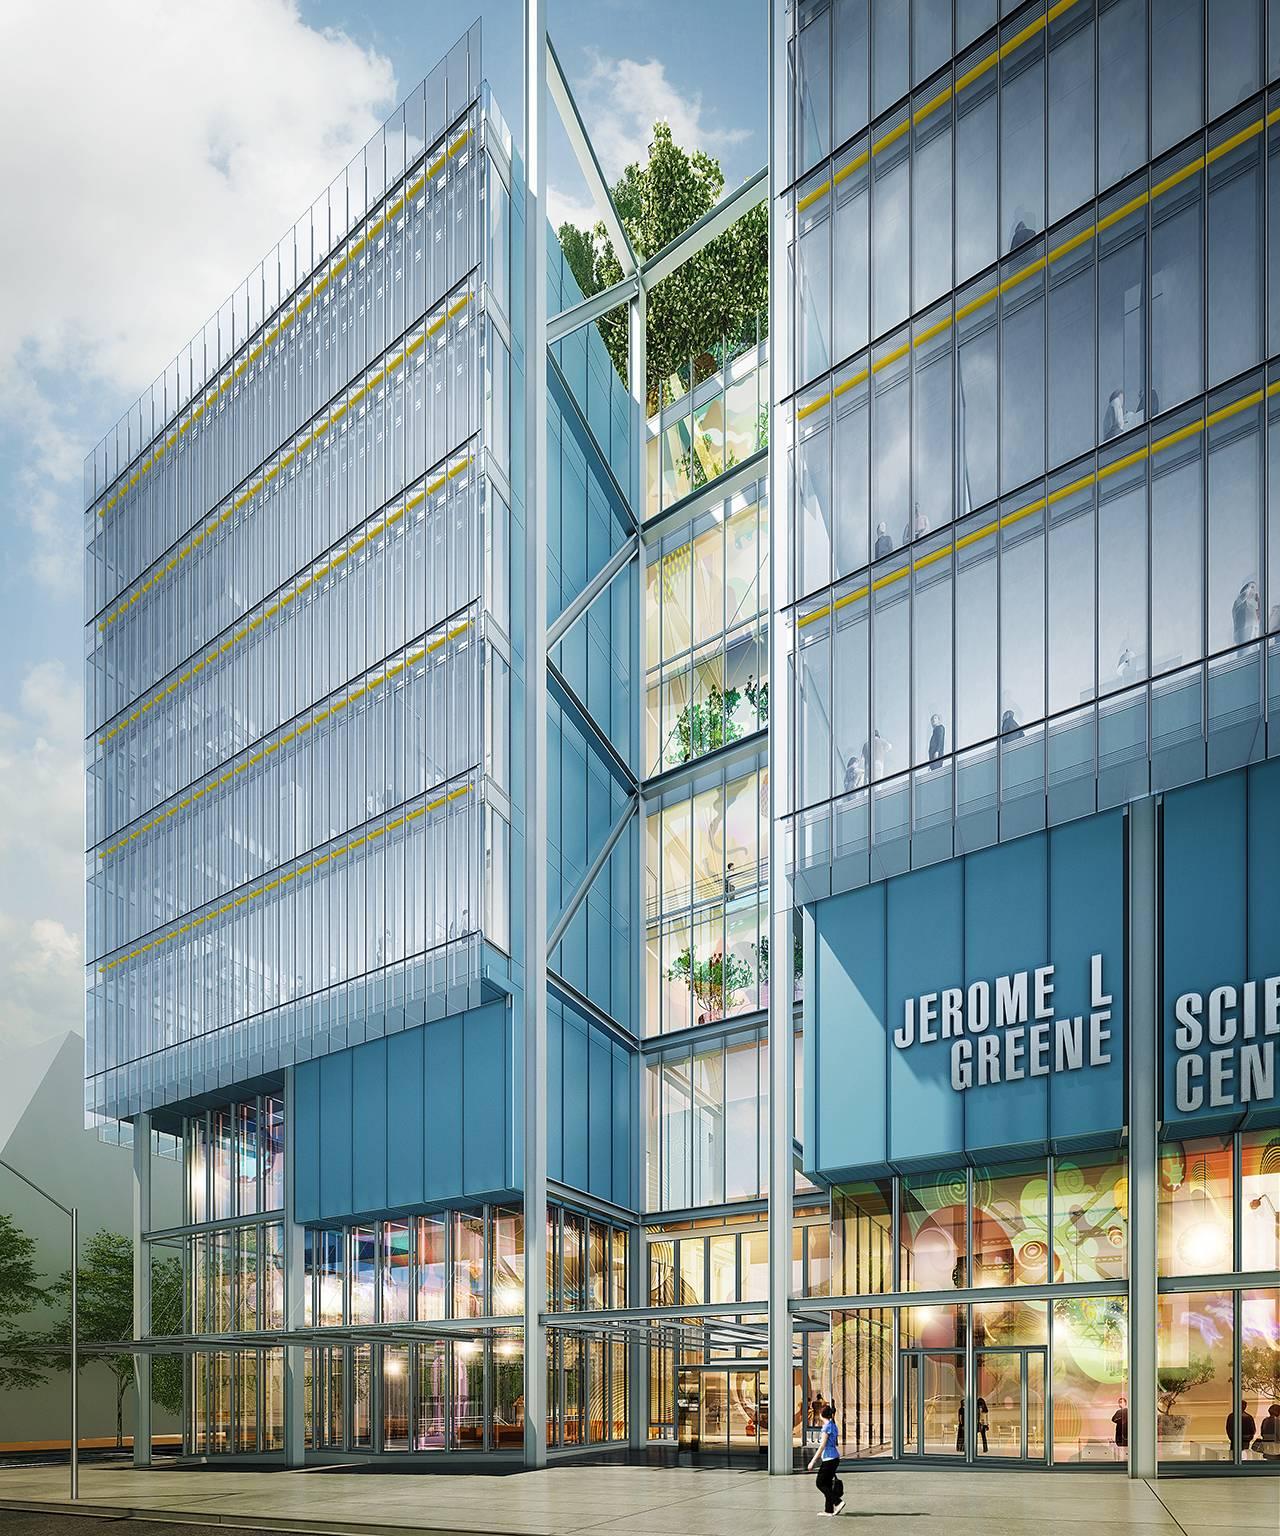 Jerome L. Greene Science Center